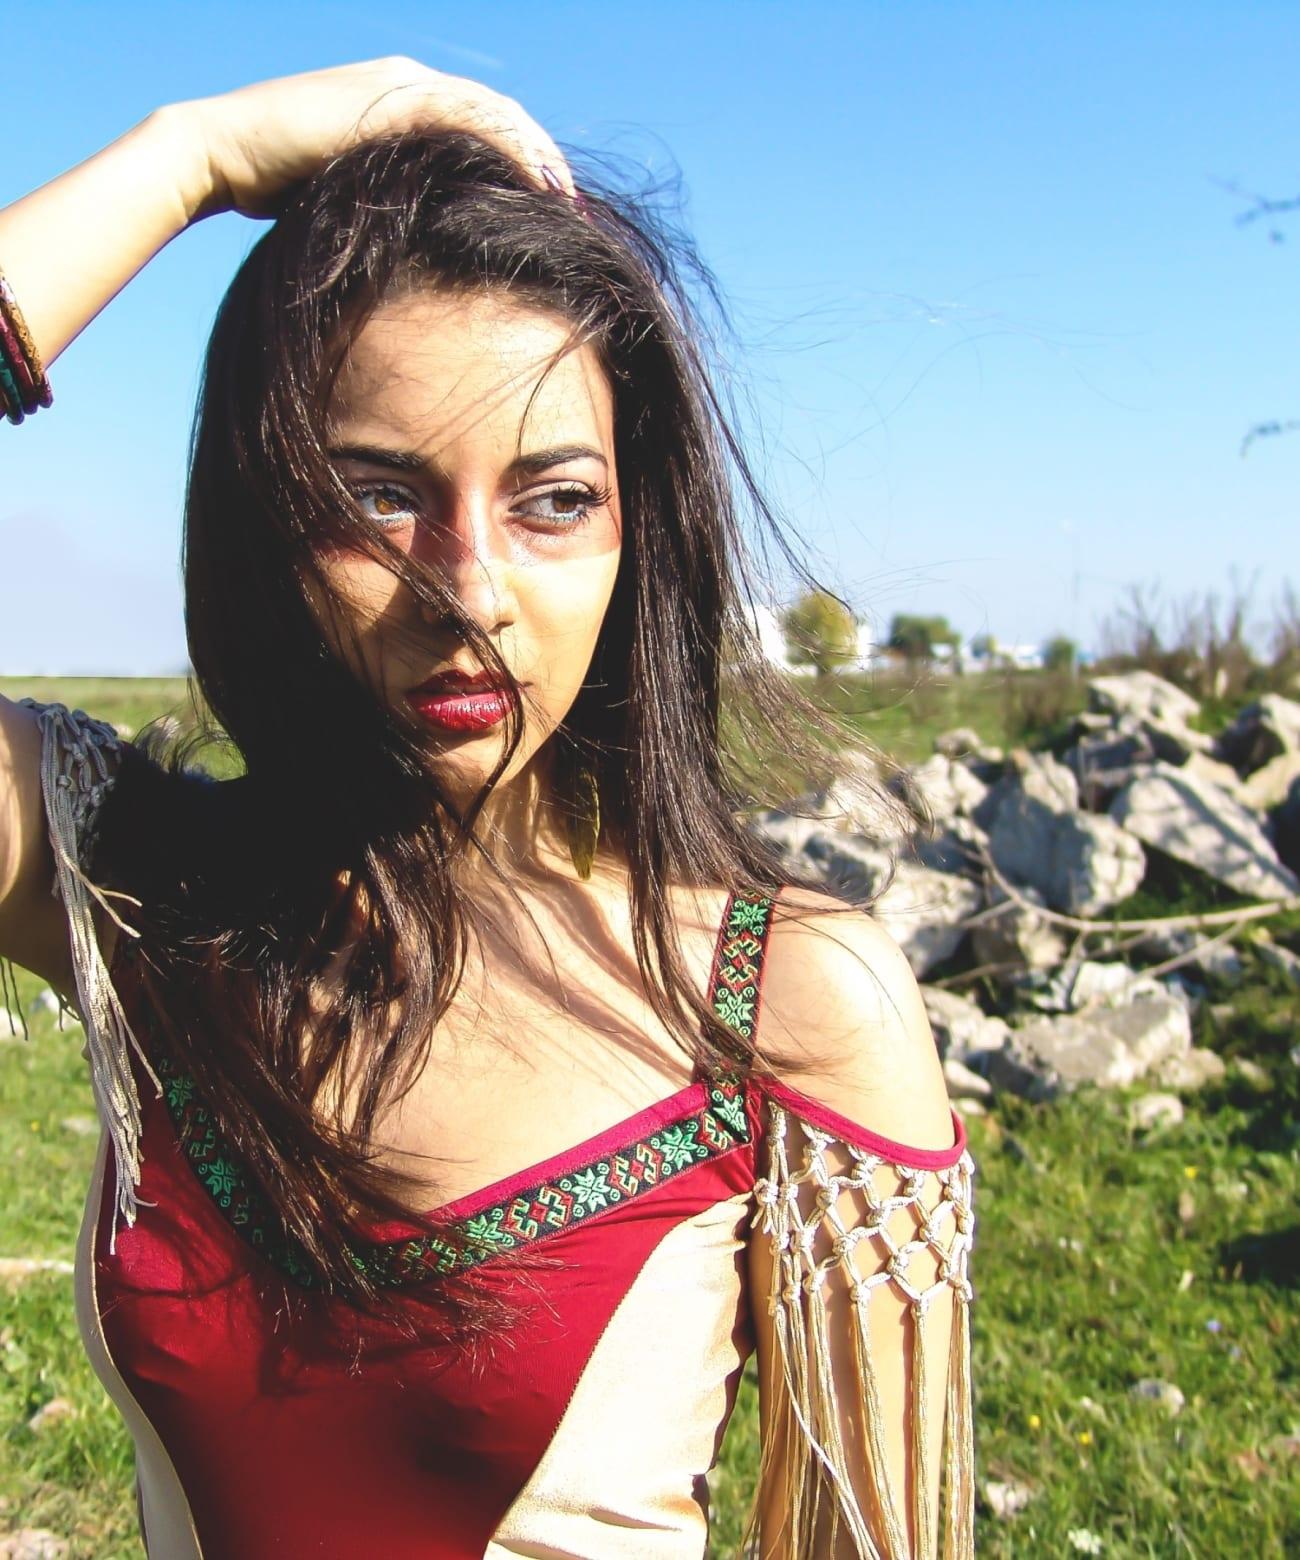 roxi rose fashion blog romania halloween indian native costume wildfashion (12)